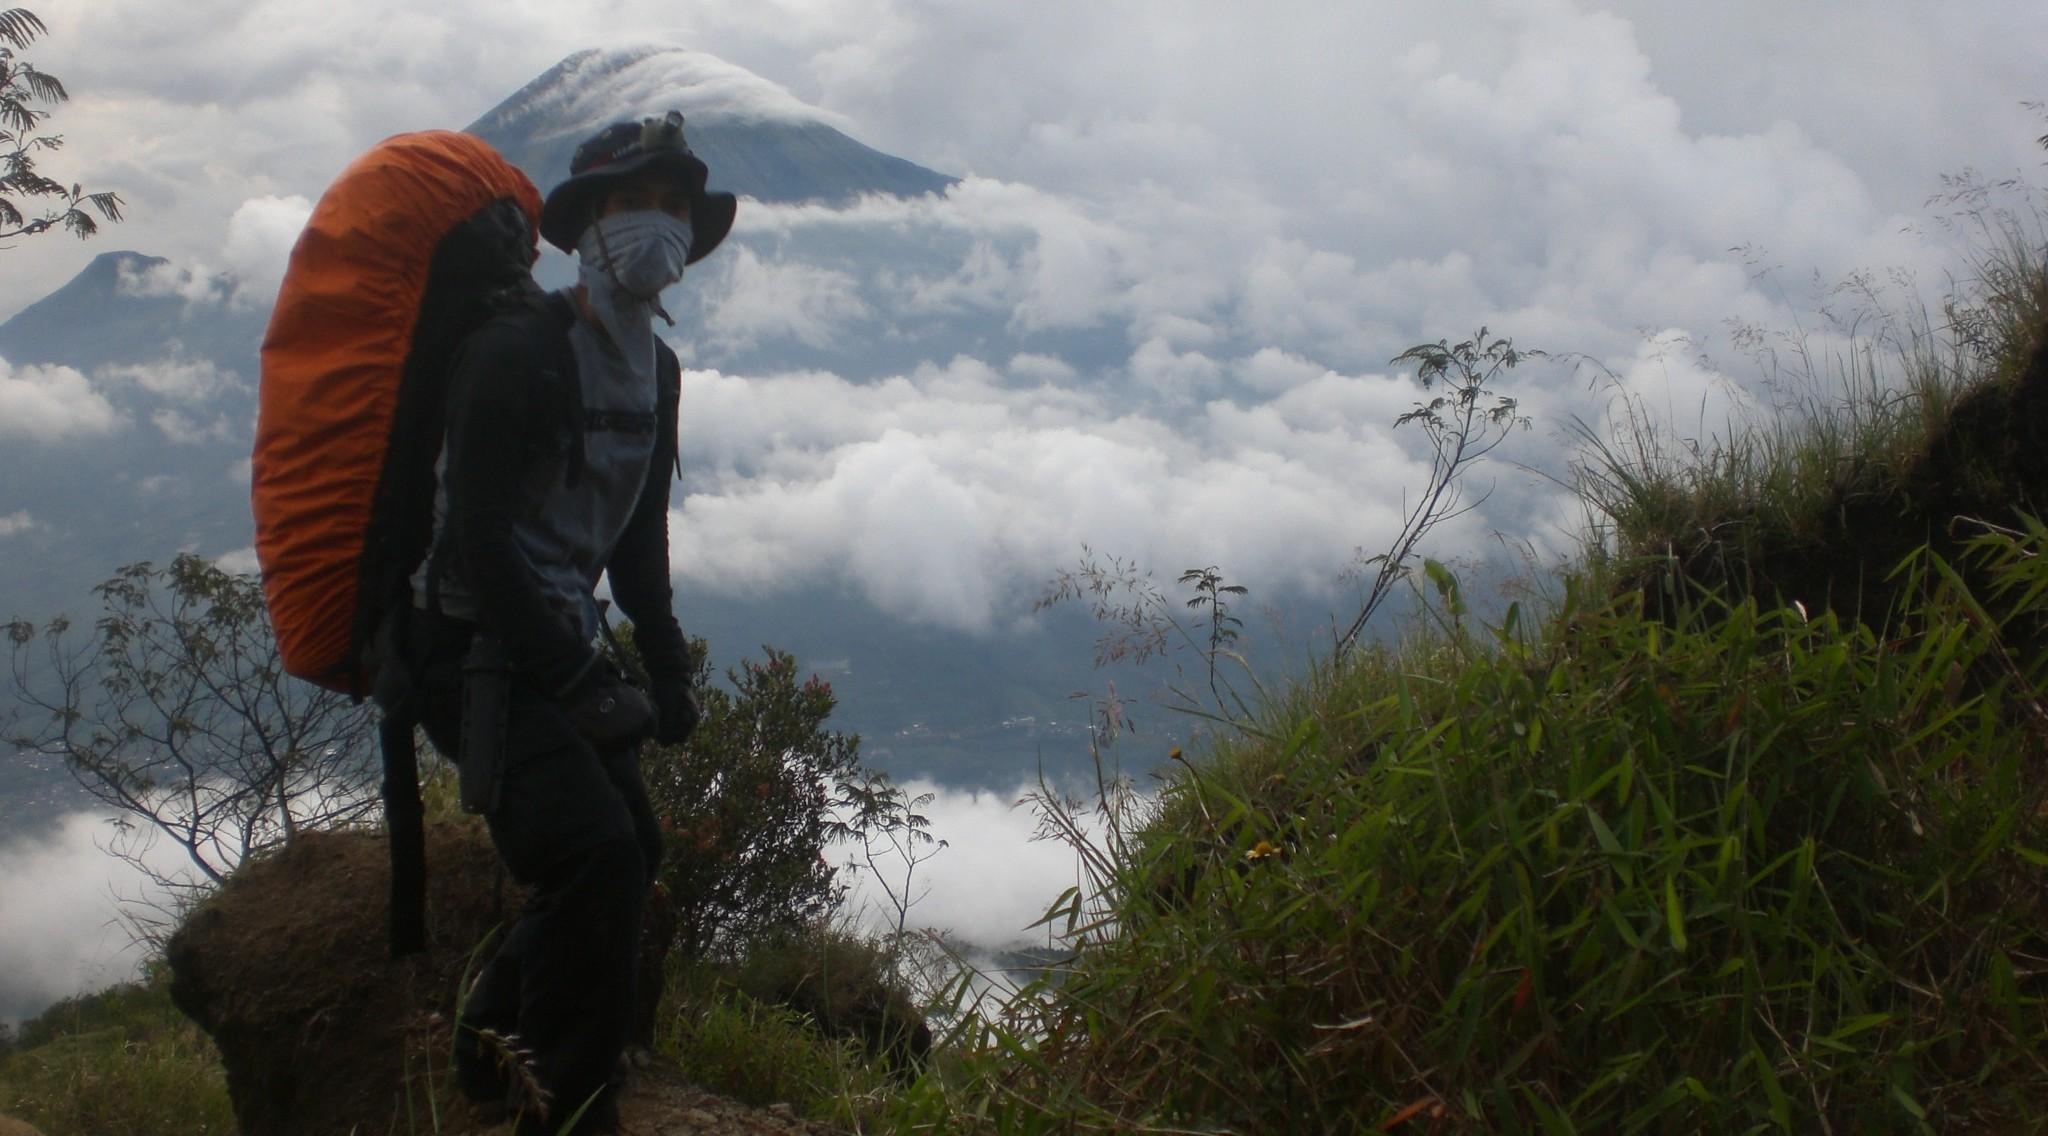 Rincian Biaya Pendakian Gunung Sumbing